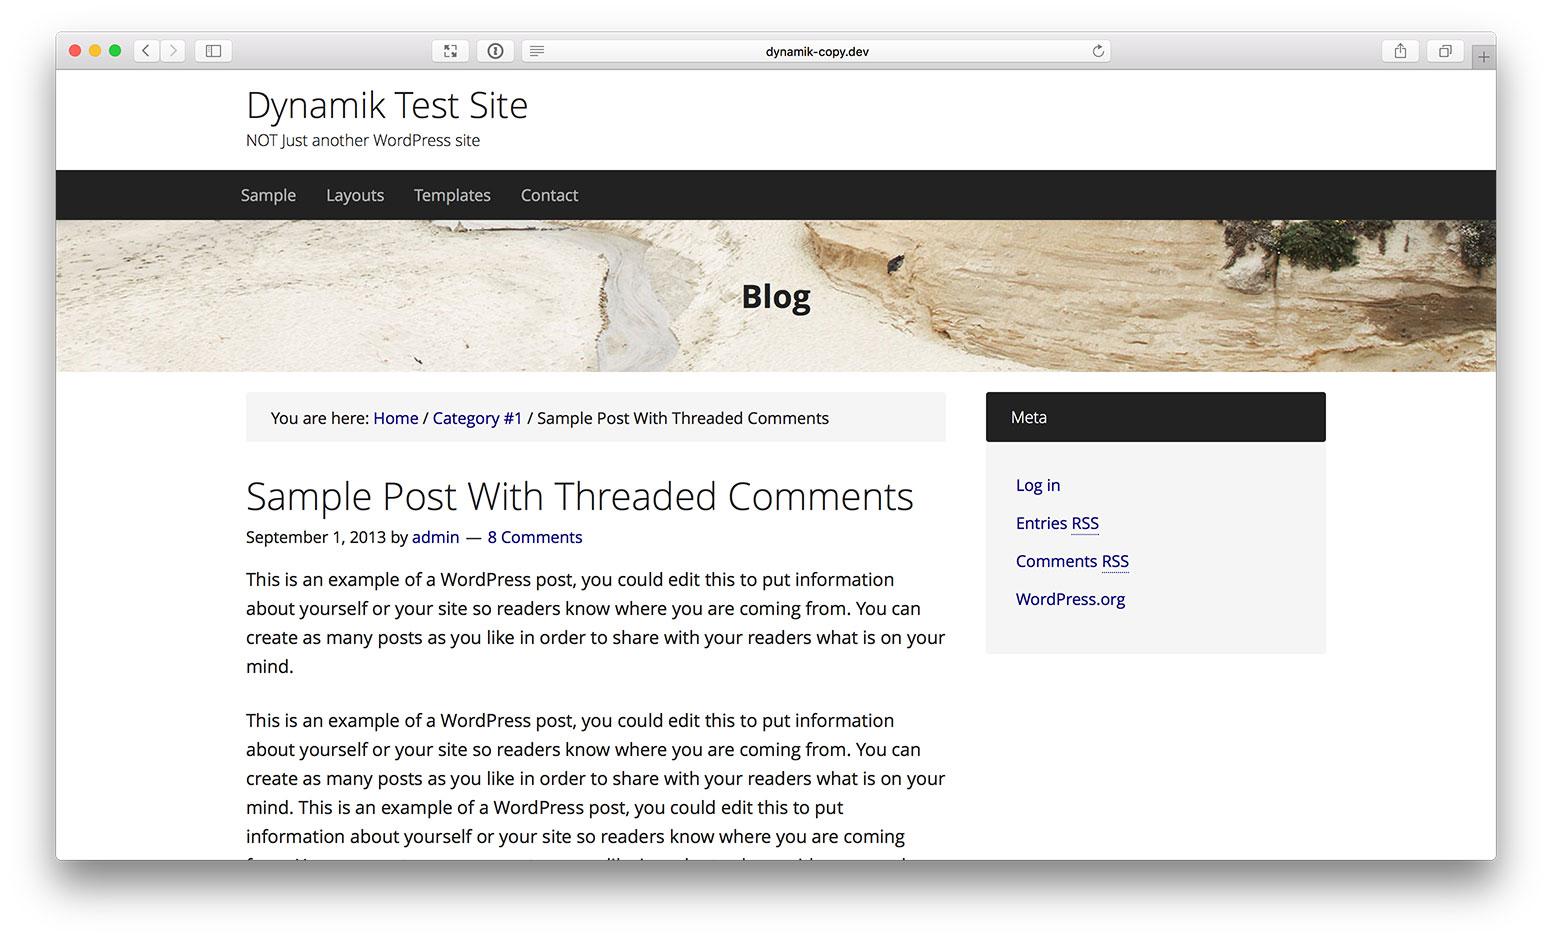 blog-banner-dynamik